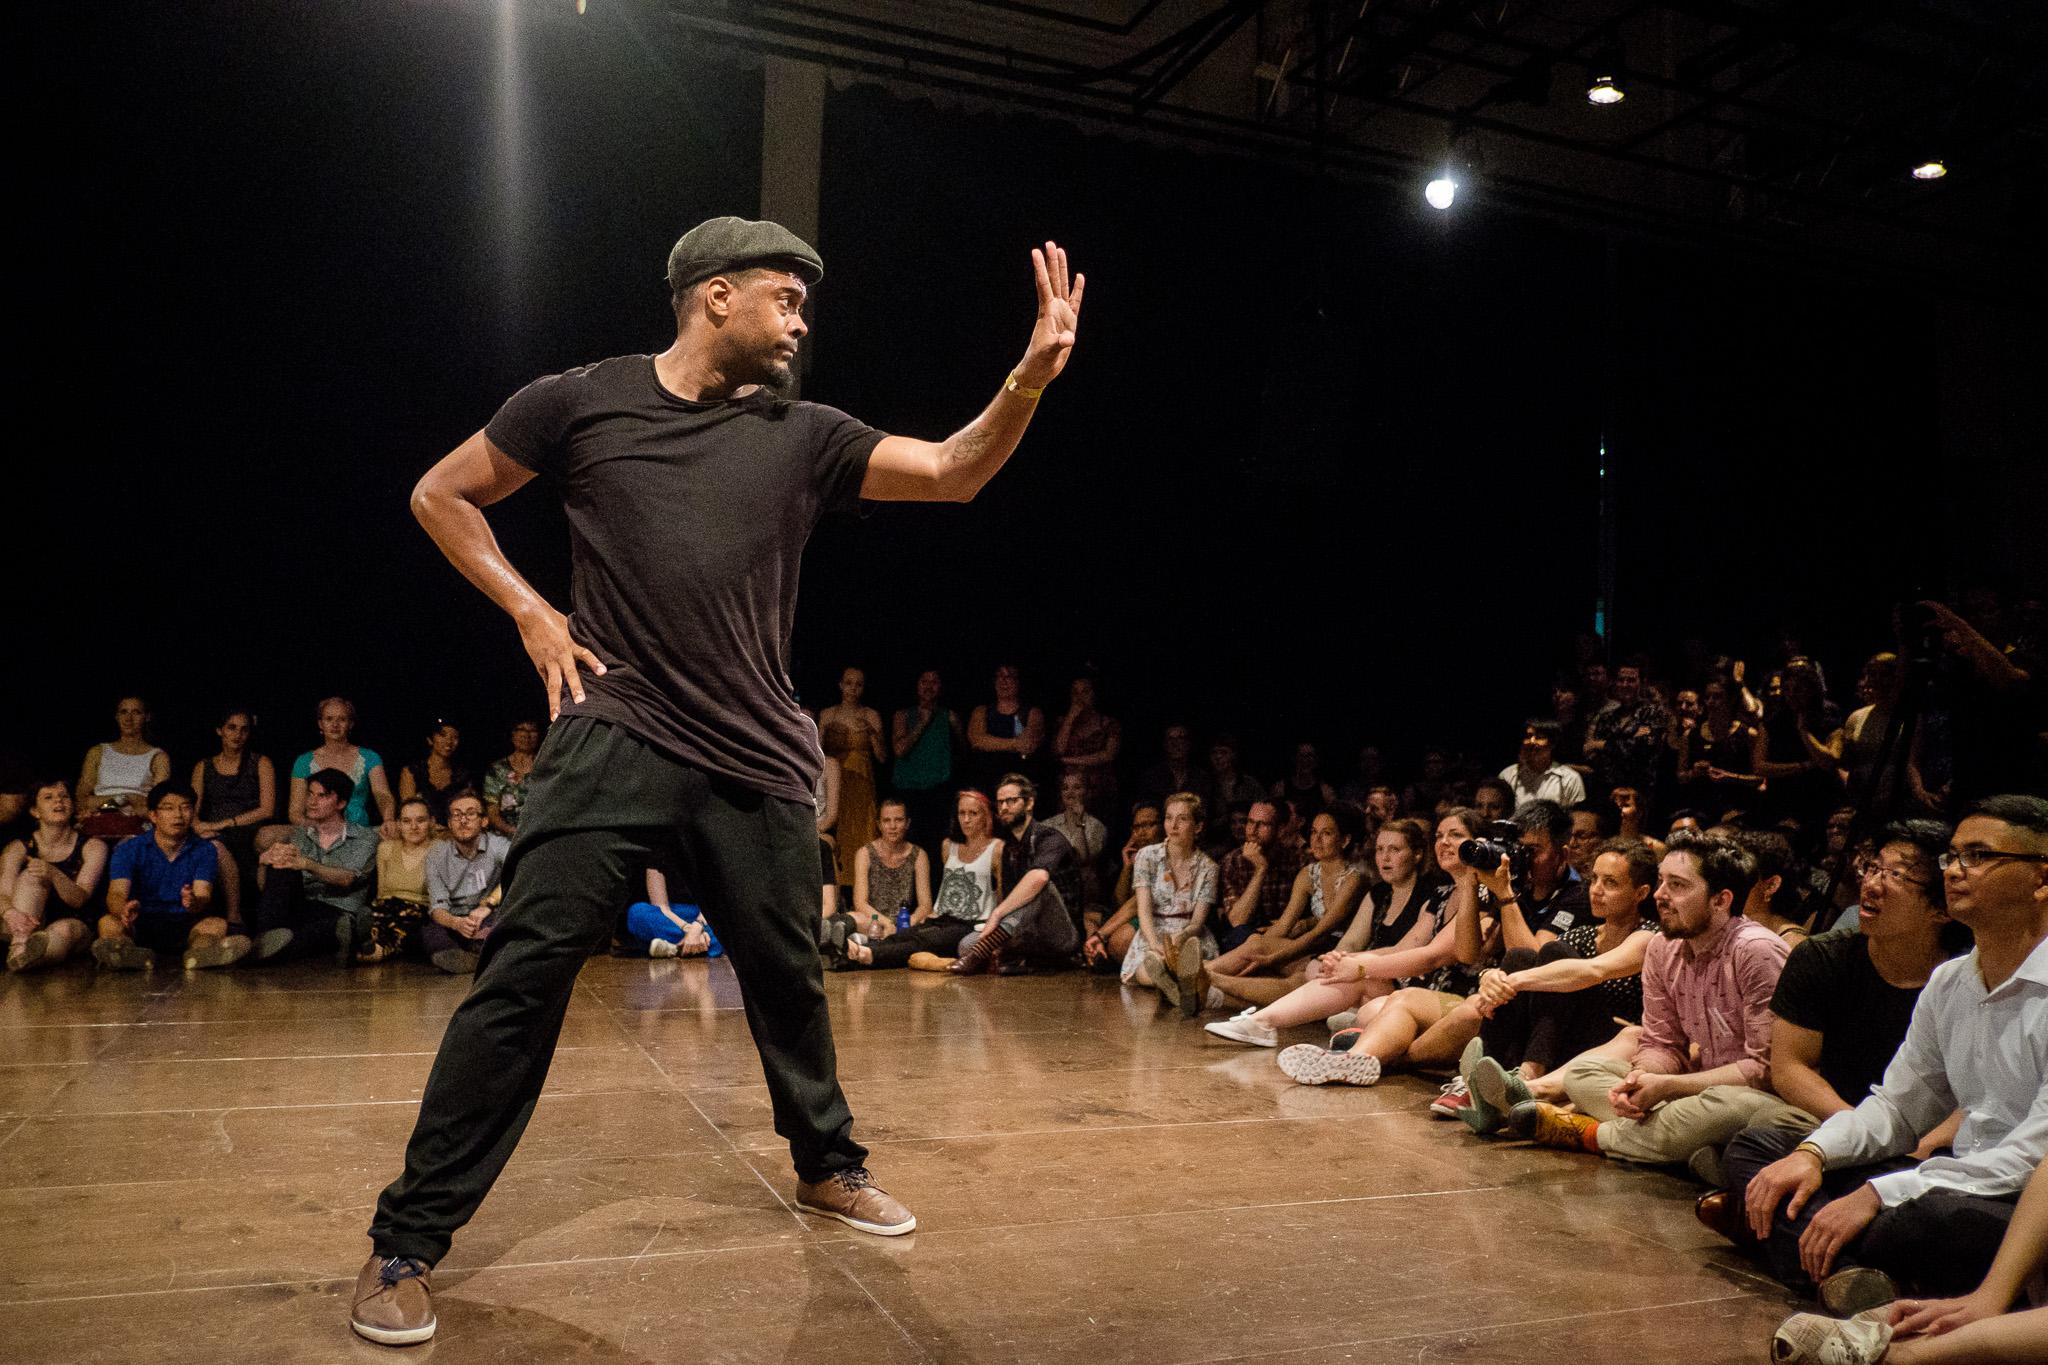 montreal-swing-riot-2012691.jpg